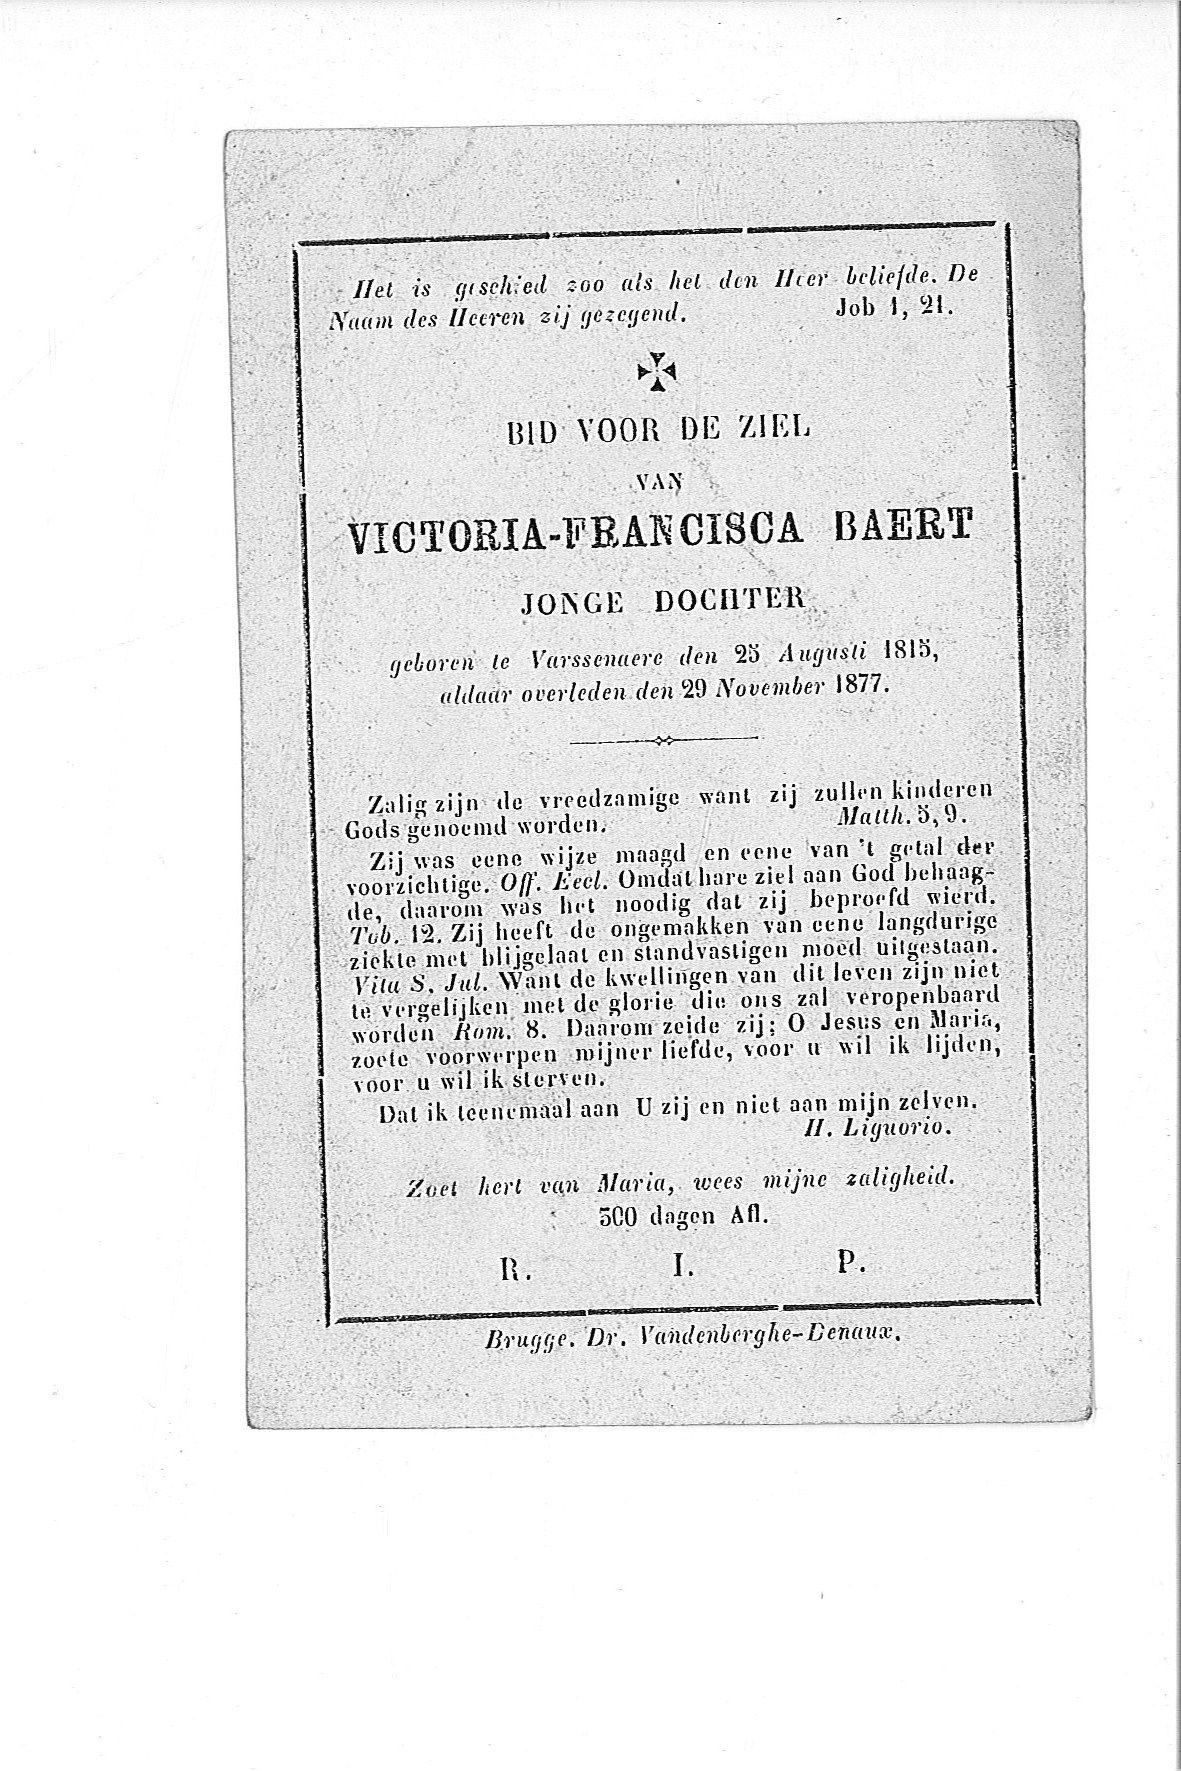 victoria-francisca(1878)20090514091751_00016.jpg